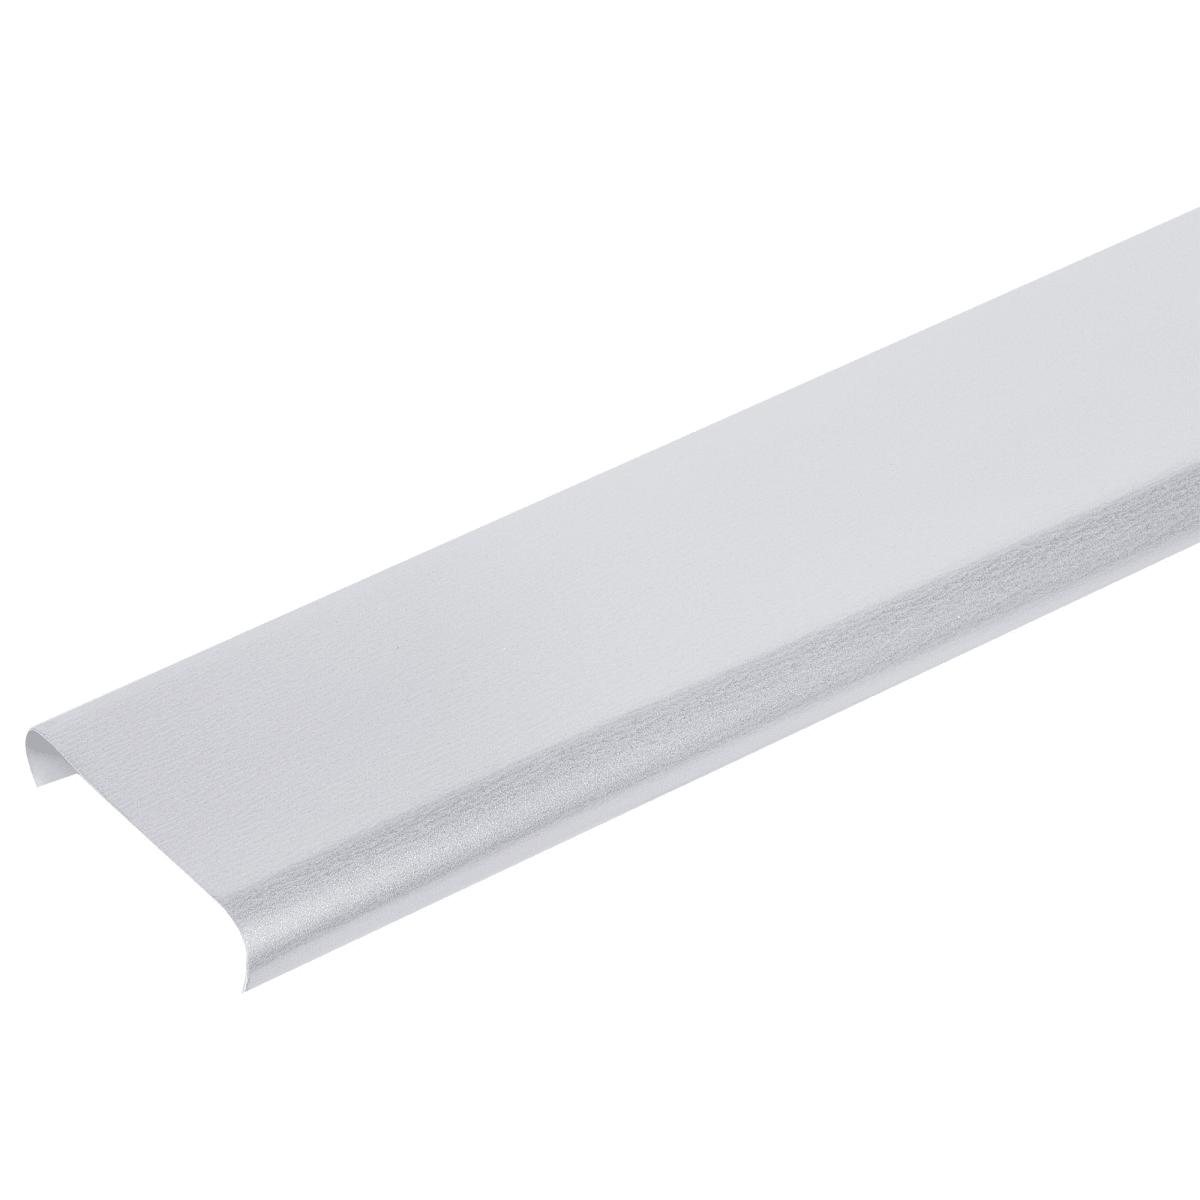 Набор реек 2х1 м цвет серебристый металлик, без раскладки